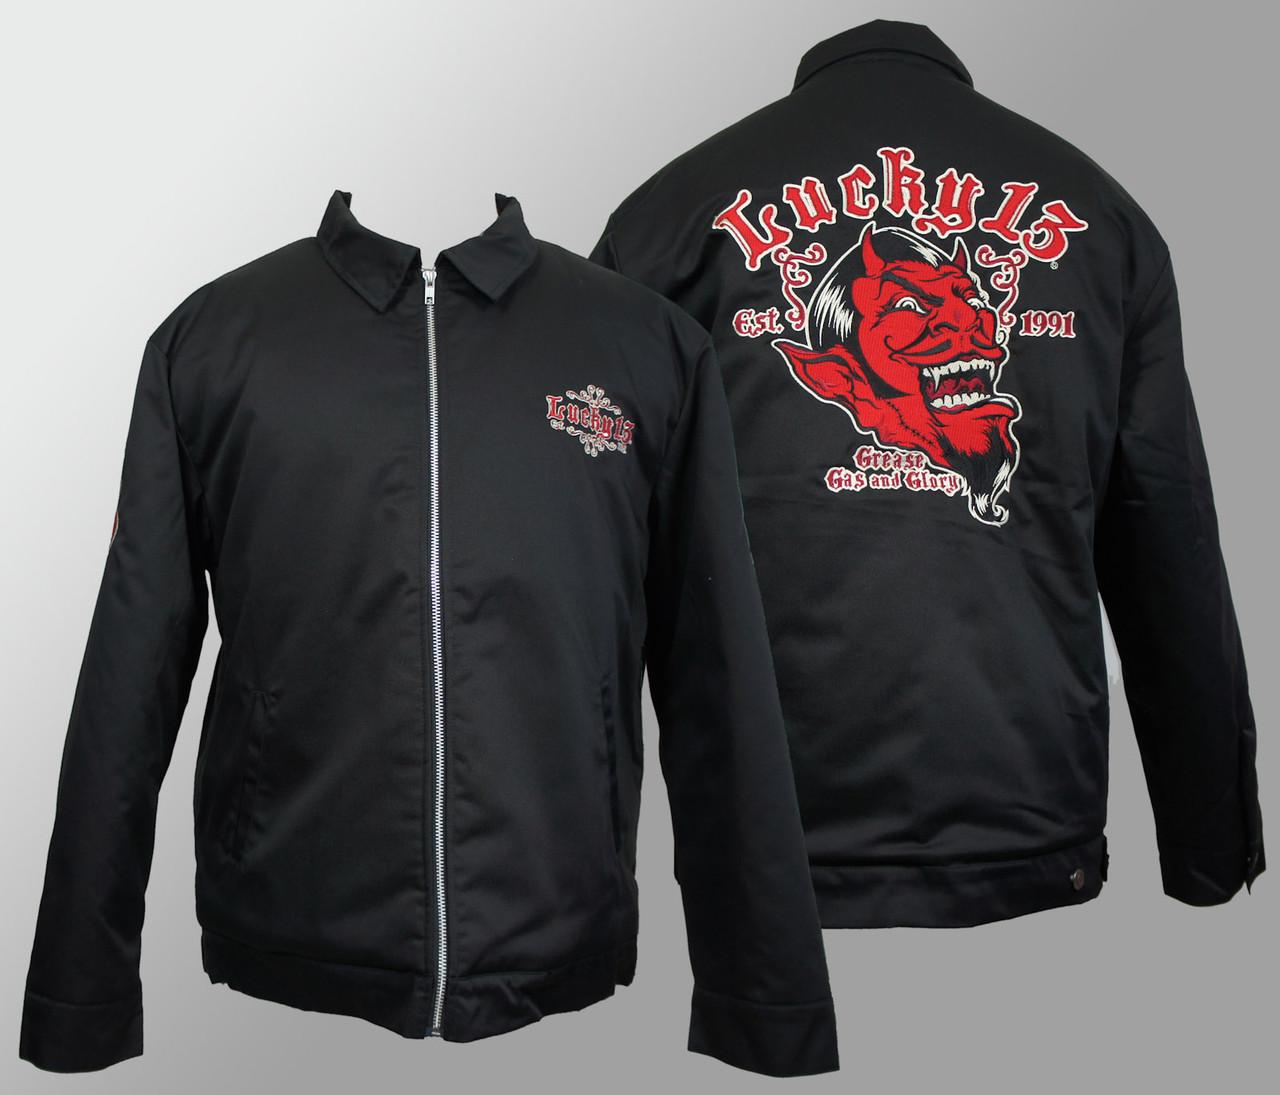 27d47d0da24 Lucky 13 Jacket - Grease Gas   Glory. Price   104.00.  http   d3d71ba2asa5oz.cloudfront.net 12013655 images lm9085gg-